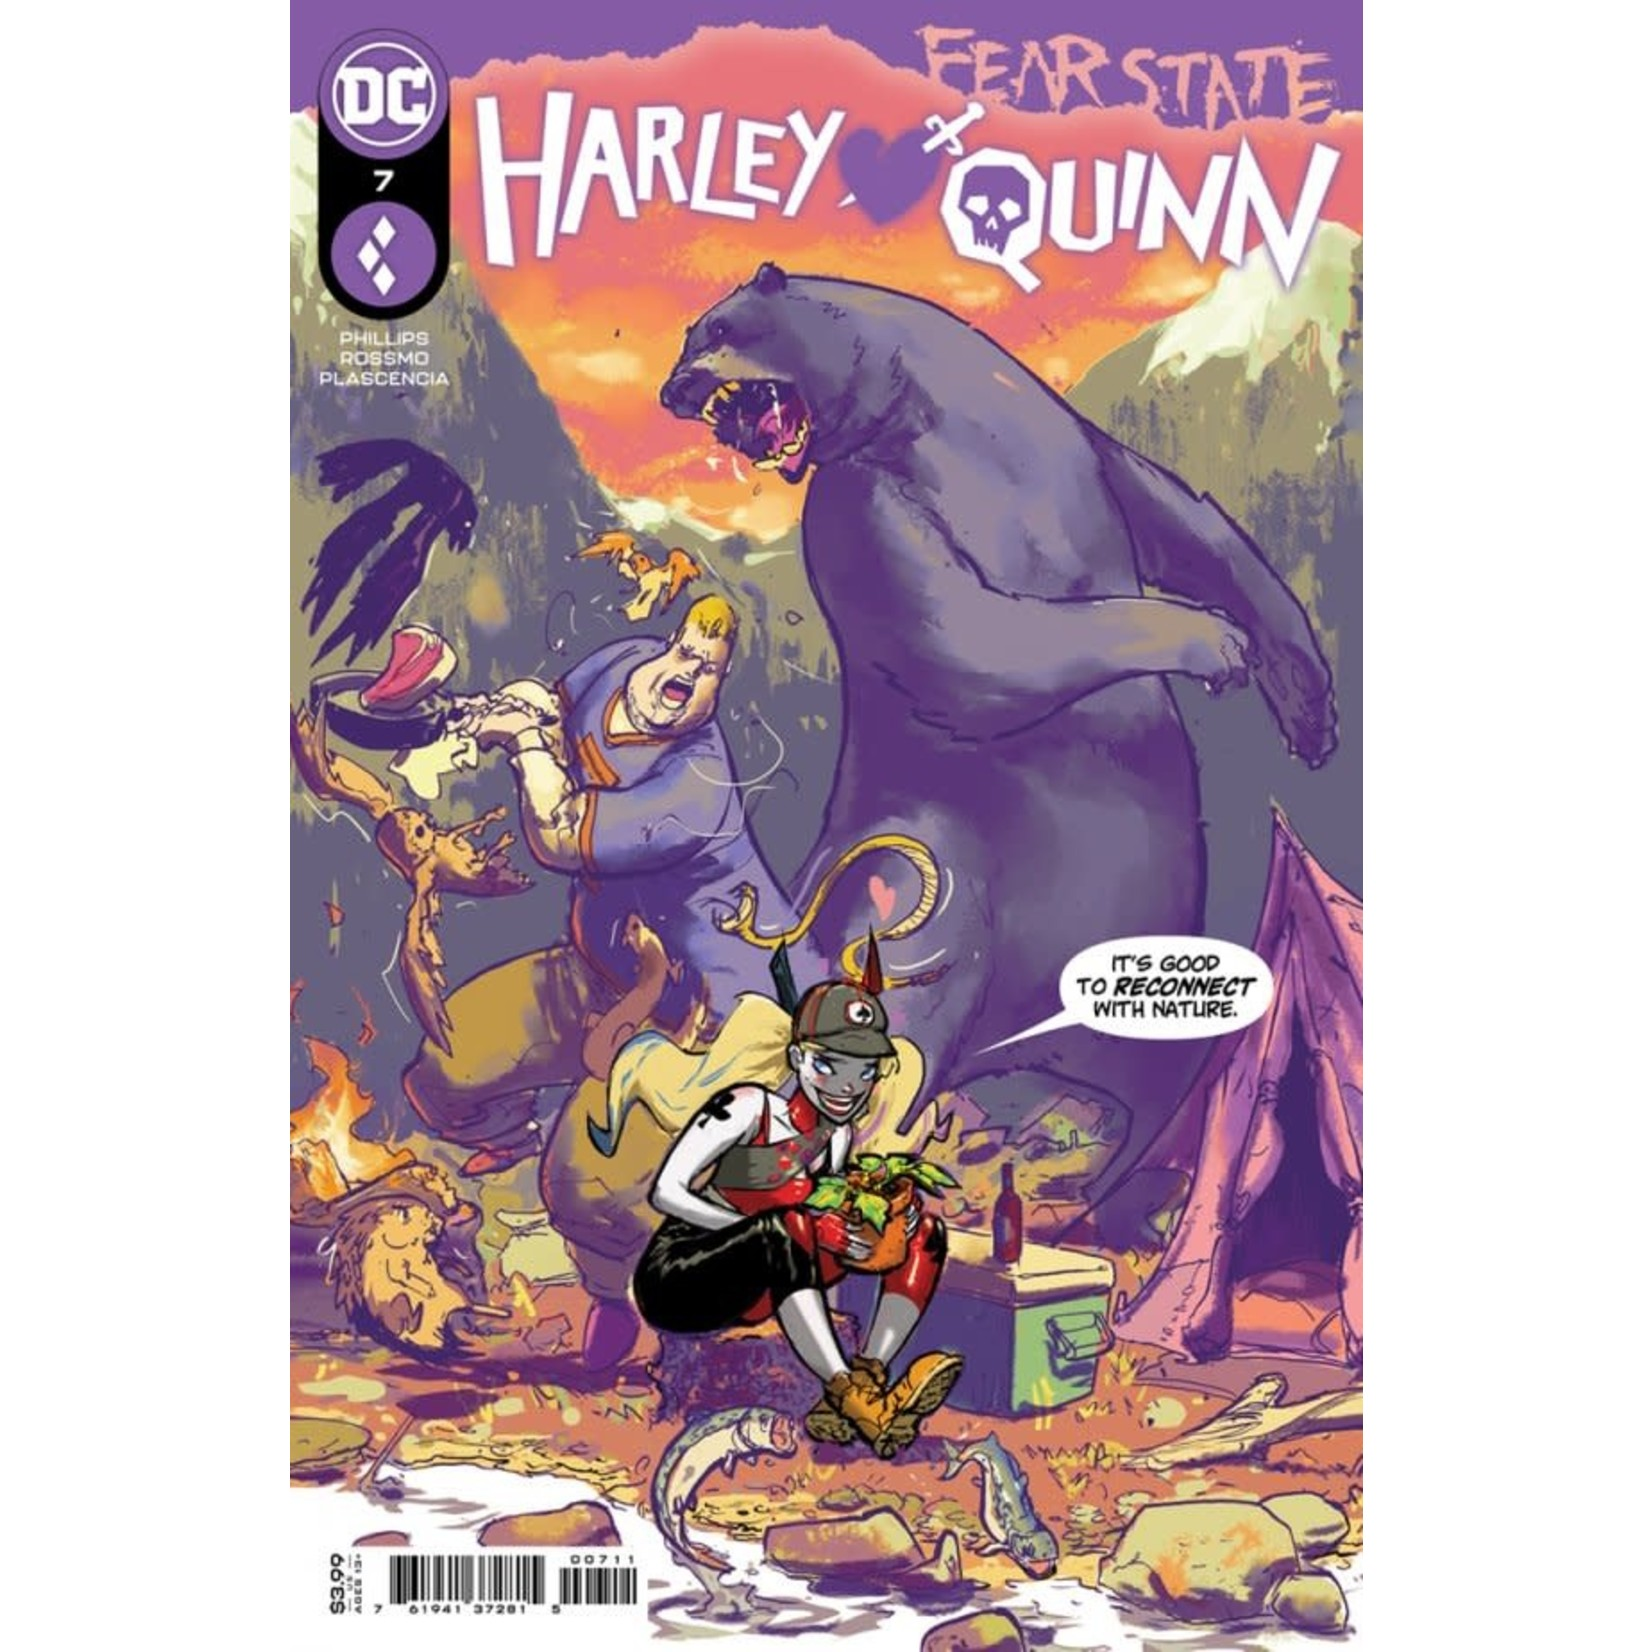 DC Comics Harley Quinn #7